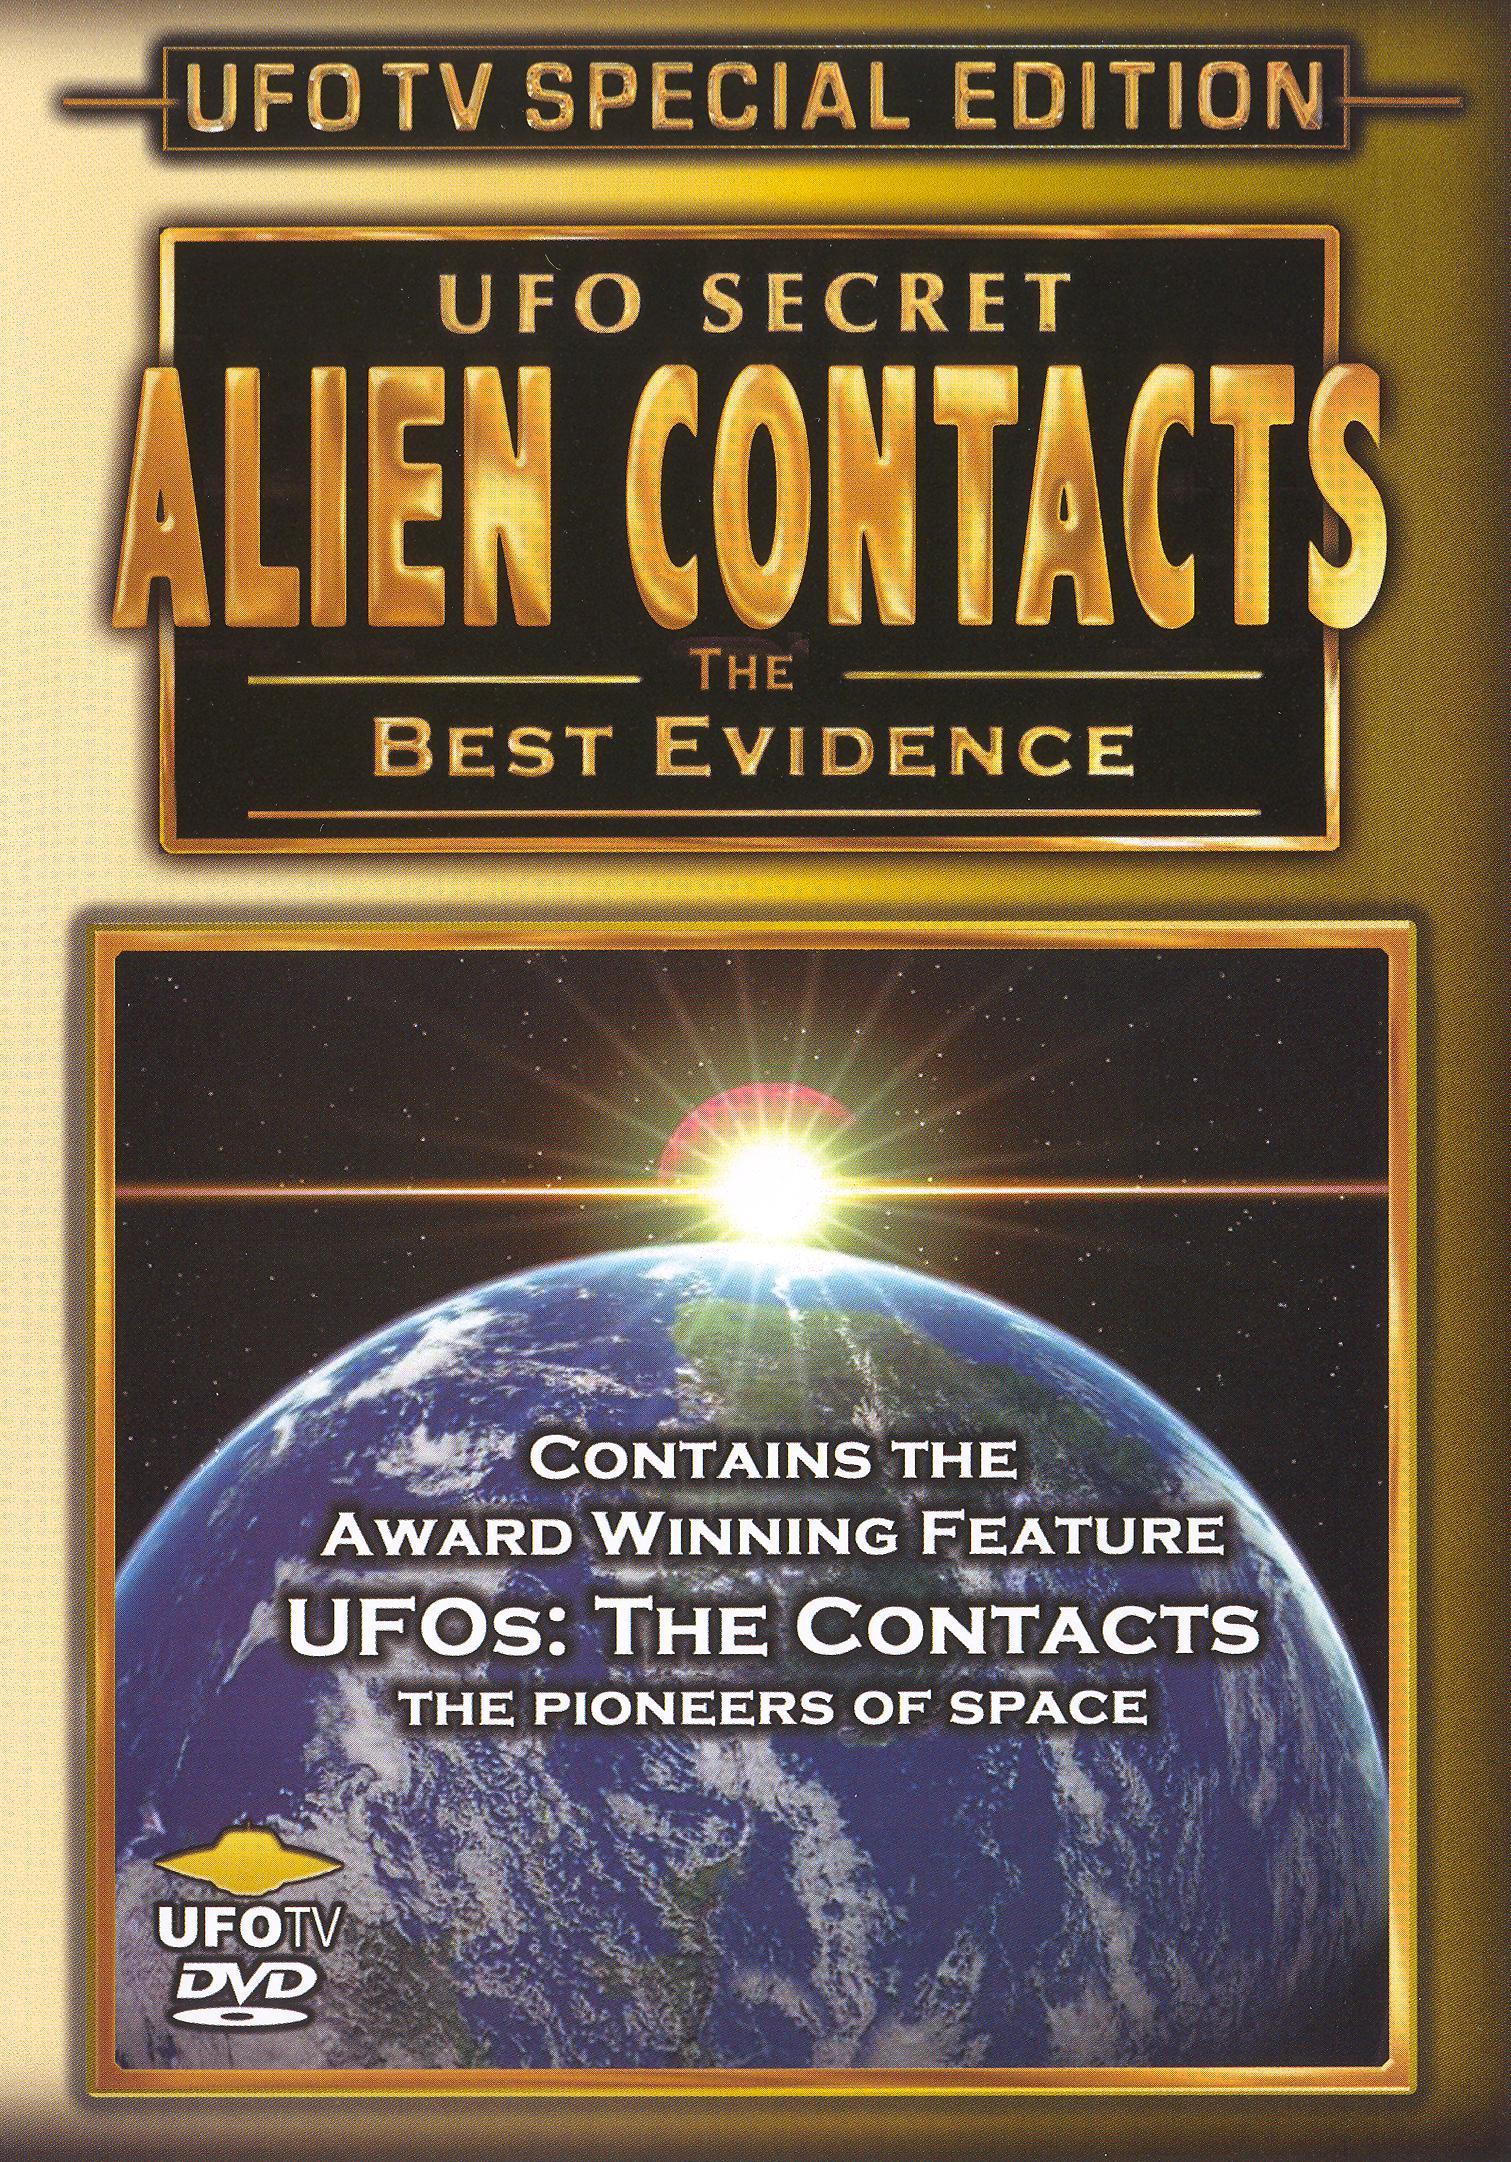 UFO Secret: Alien Contacts - The Best Evidence